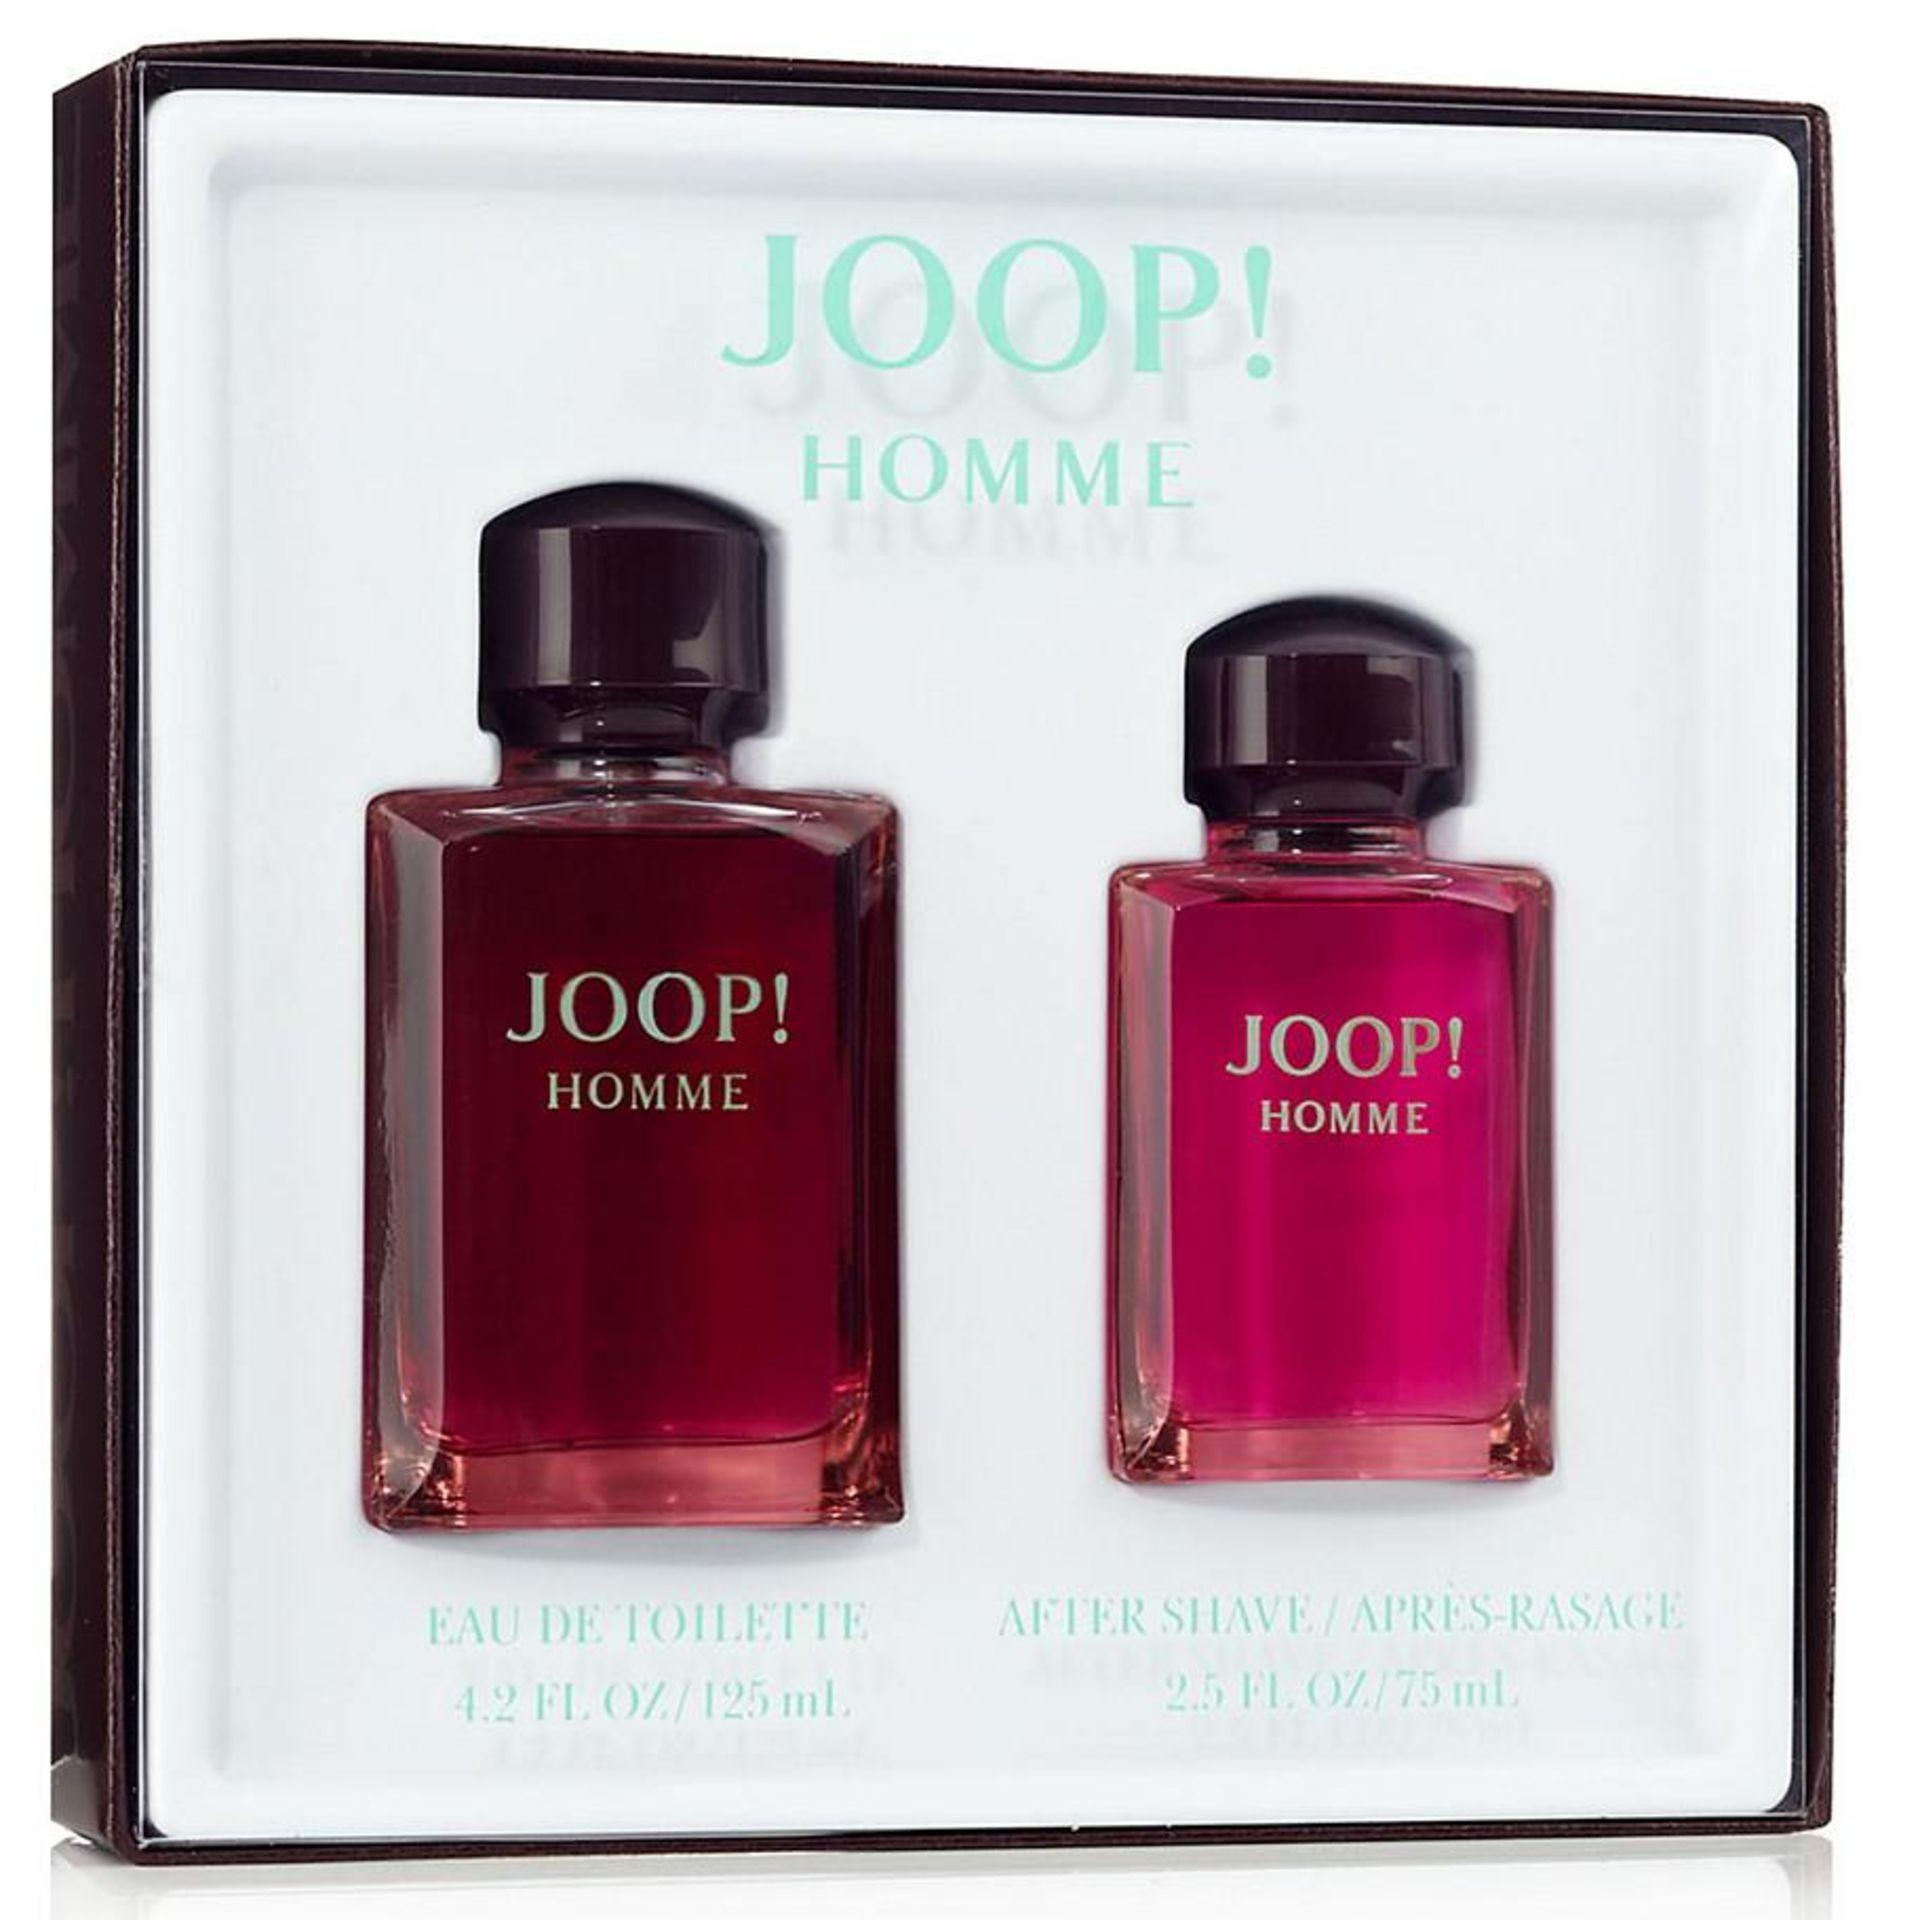 Lot 10104 - V Brand New Gents Joop Gift Set - 125ml Eau De Toilette Spray & 75ml Aftershave